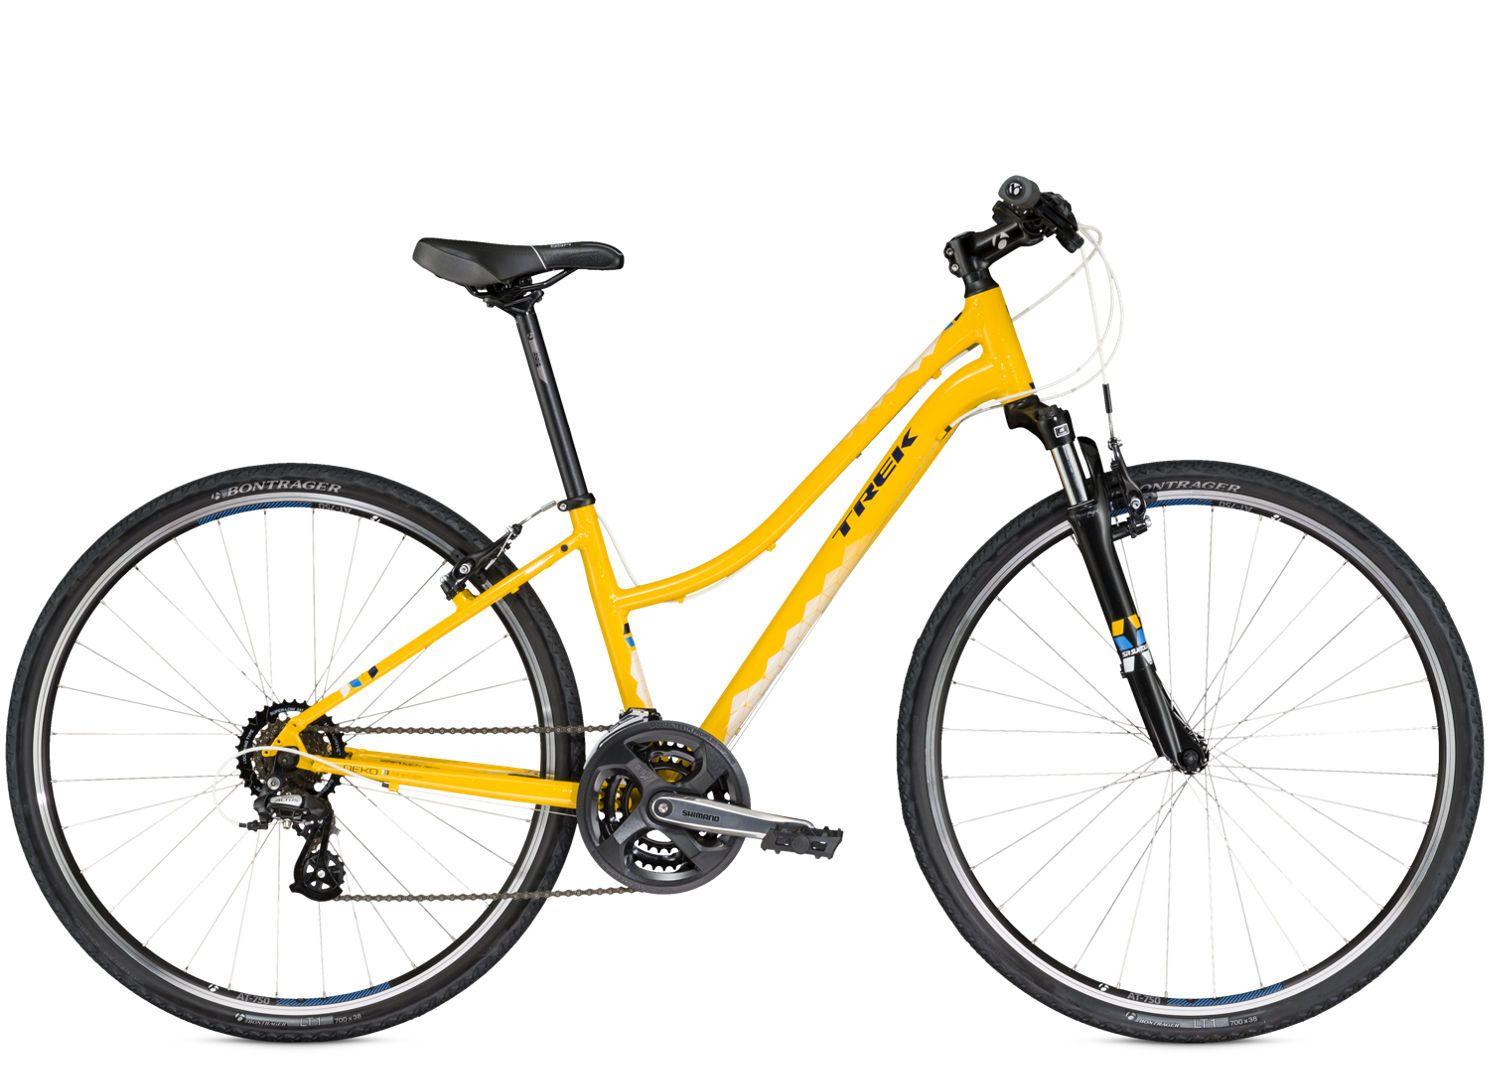 Neko Women's Trek Bicycle Hybrid bike, Trek bikes